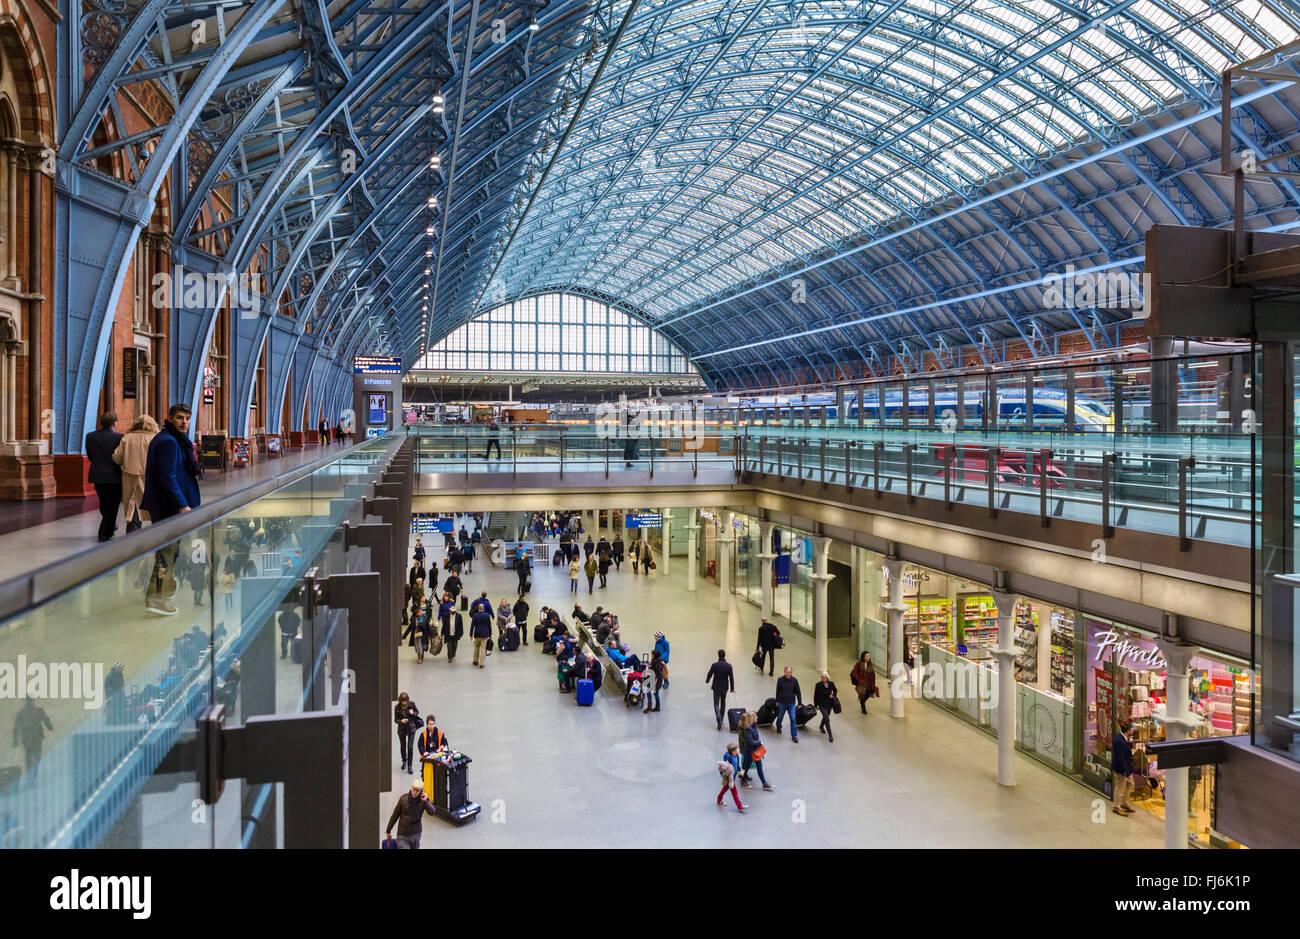 St Pancras International railway station, London, England, UK - Stock Image